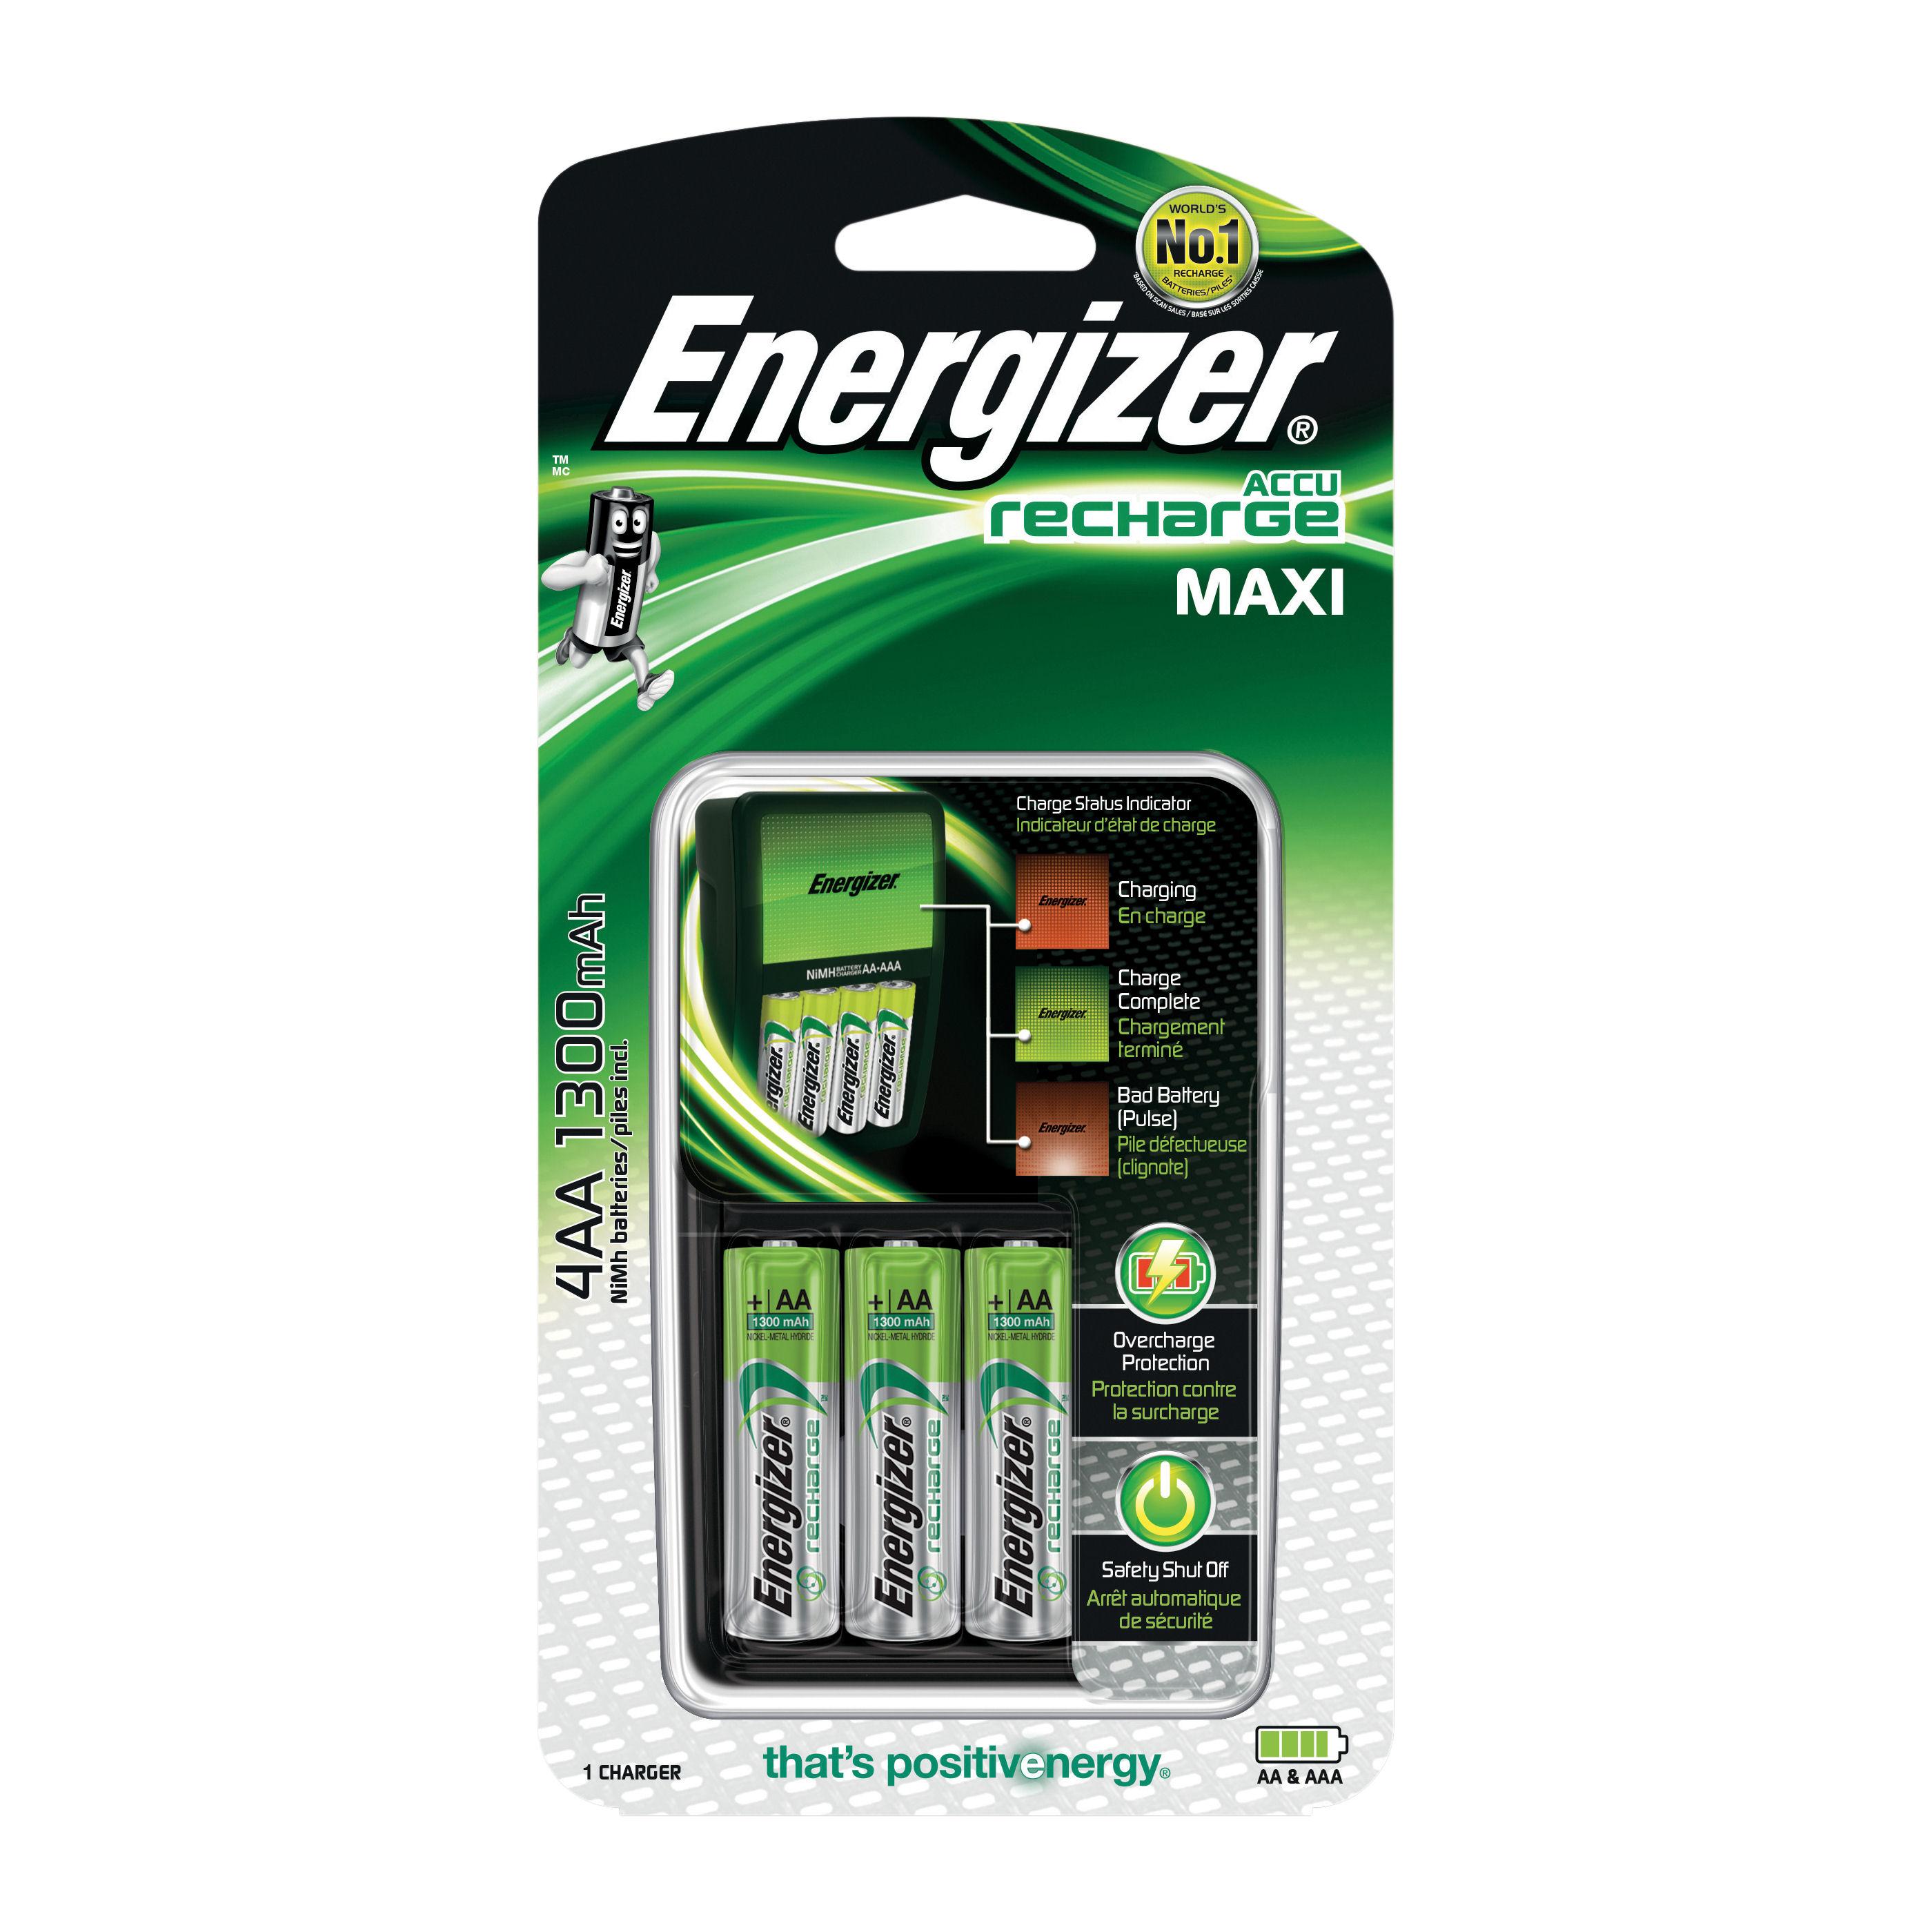 Energizer Maxi Charger 4xAA 635045